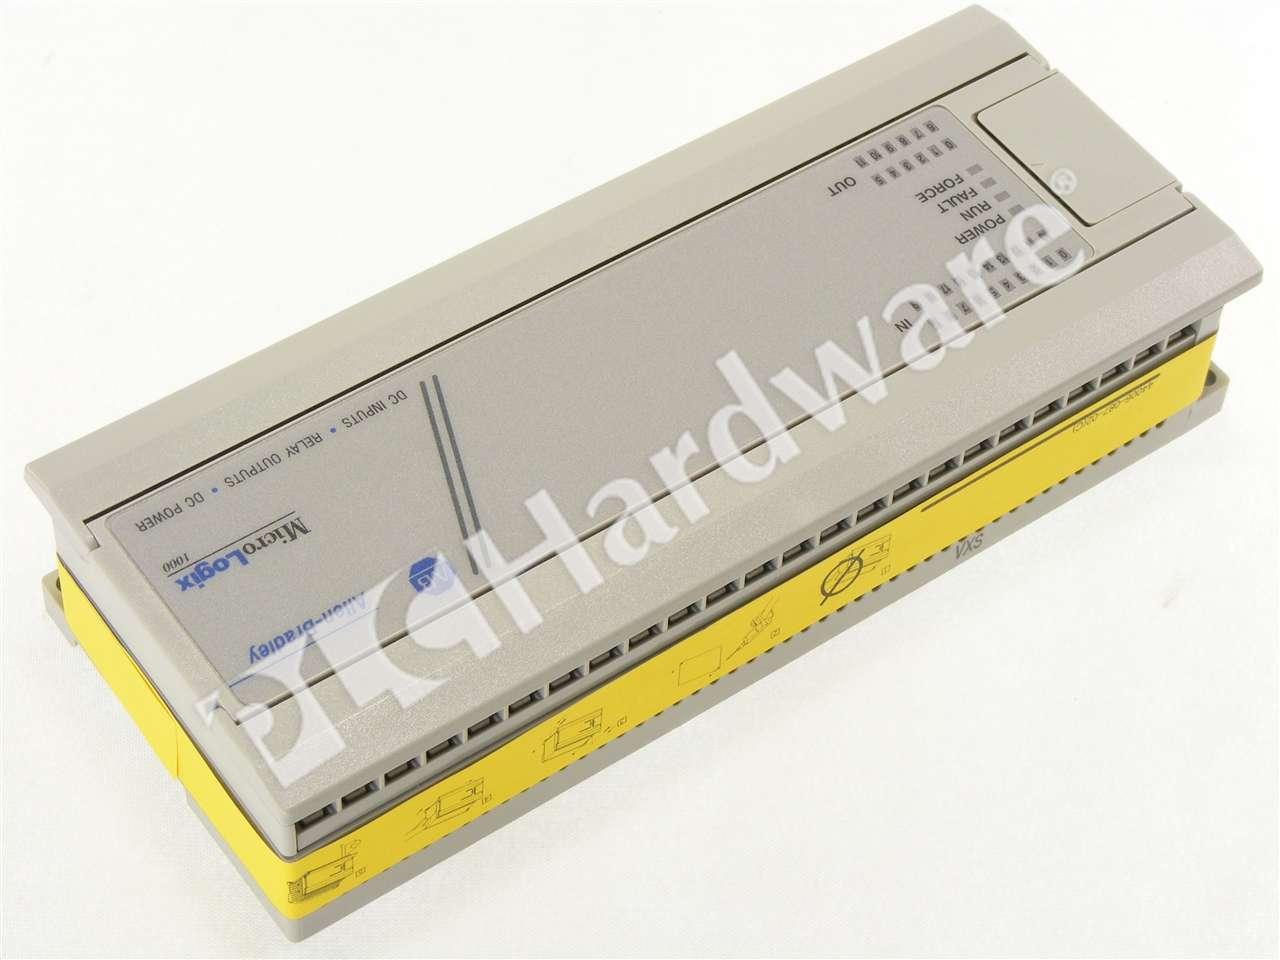 PLC Hardware: Allen-Bradley 1761-L32BWB MicroLogix 1000 Controller ...